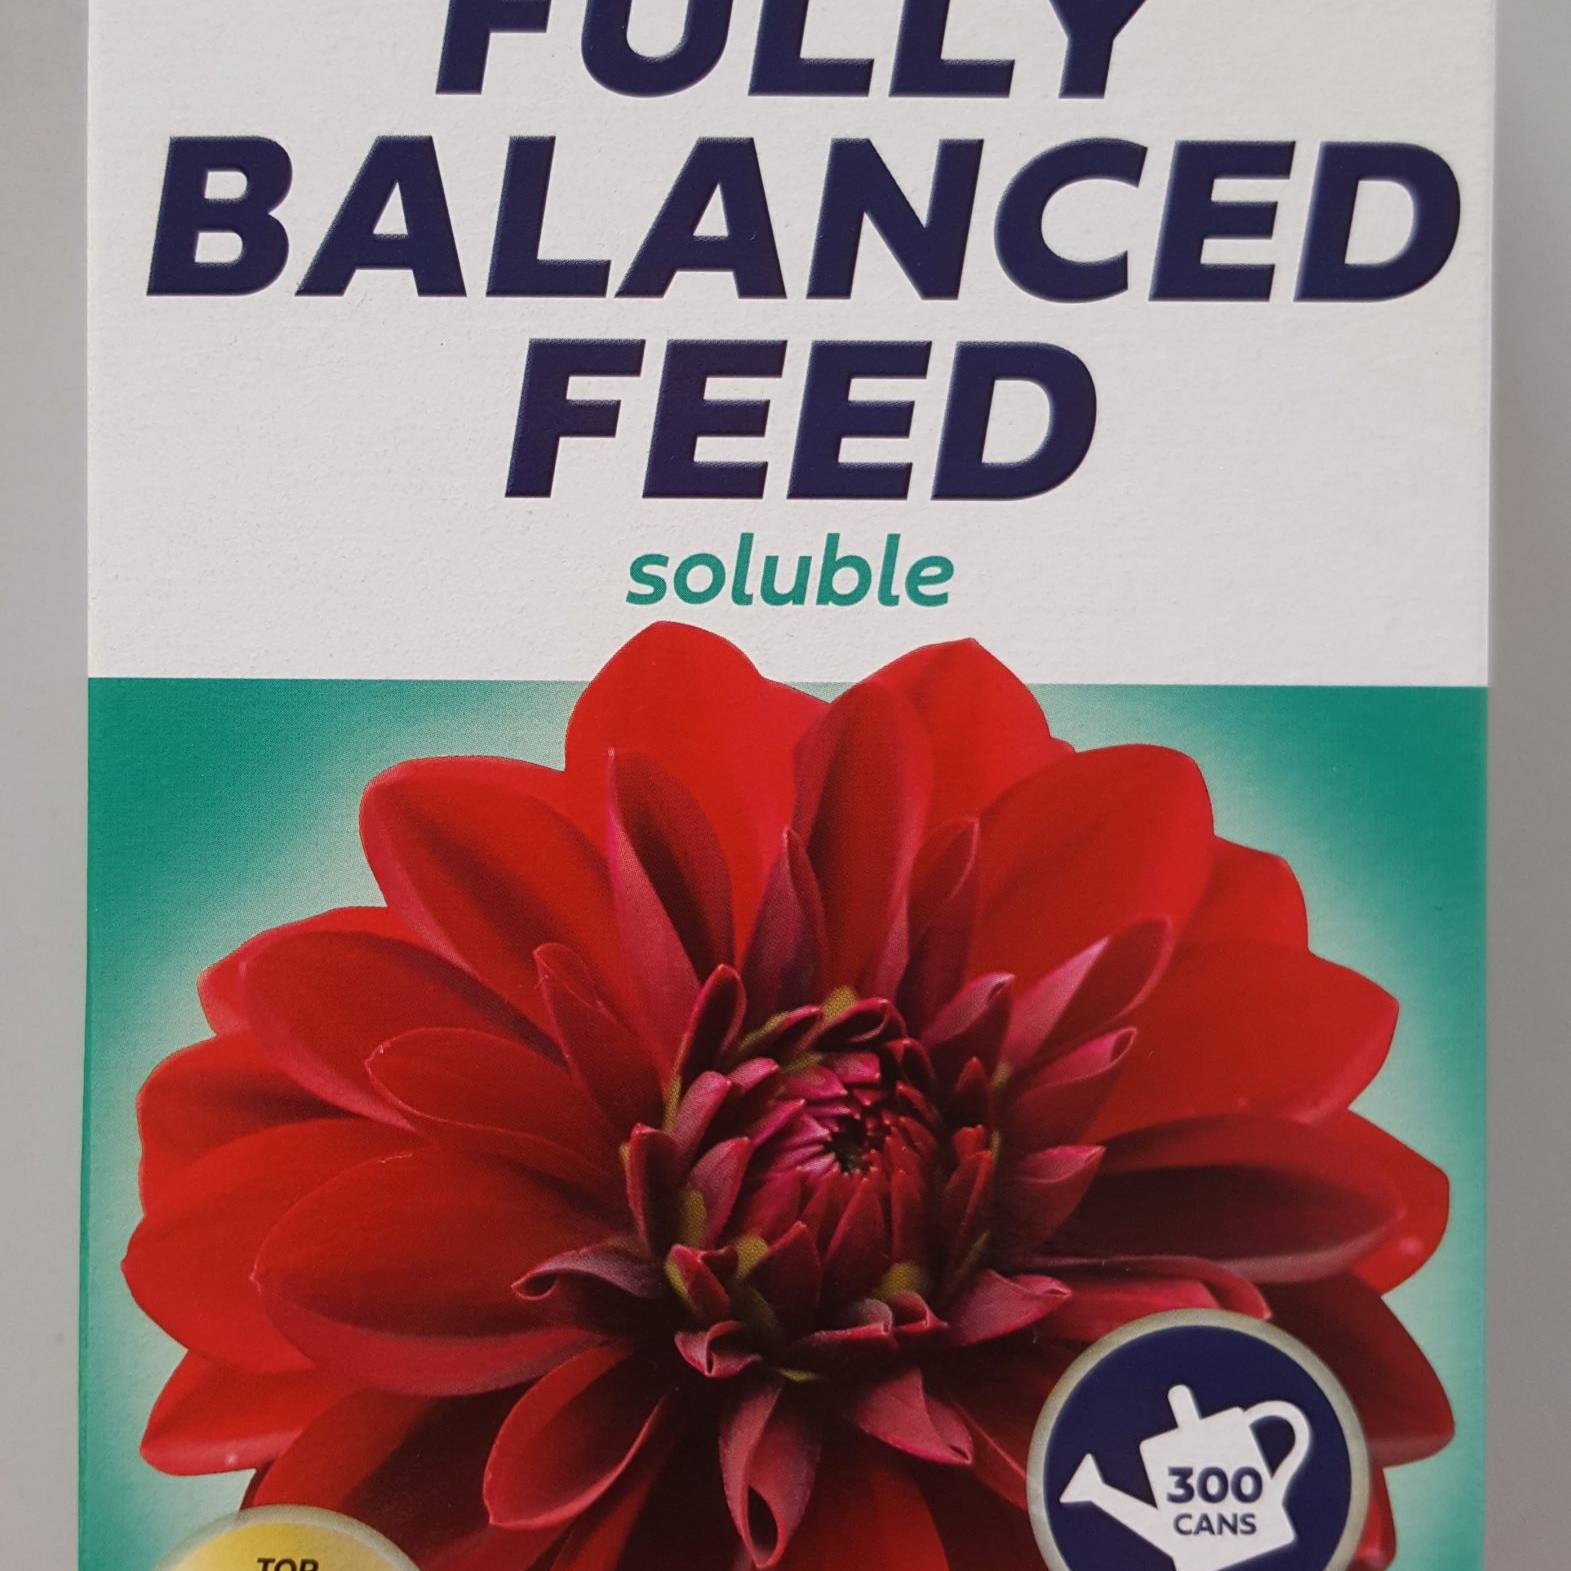 Chempak Fully Balanced Feed N03 750g